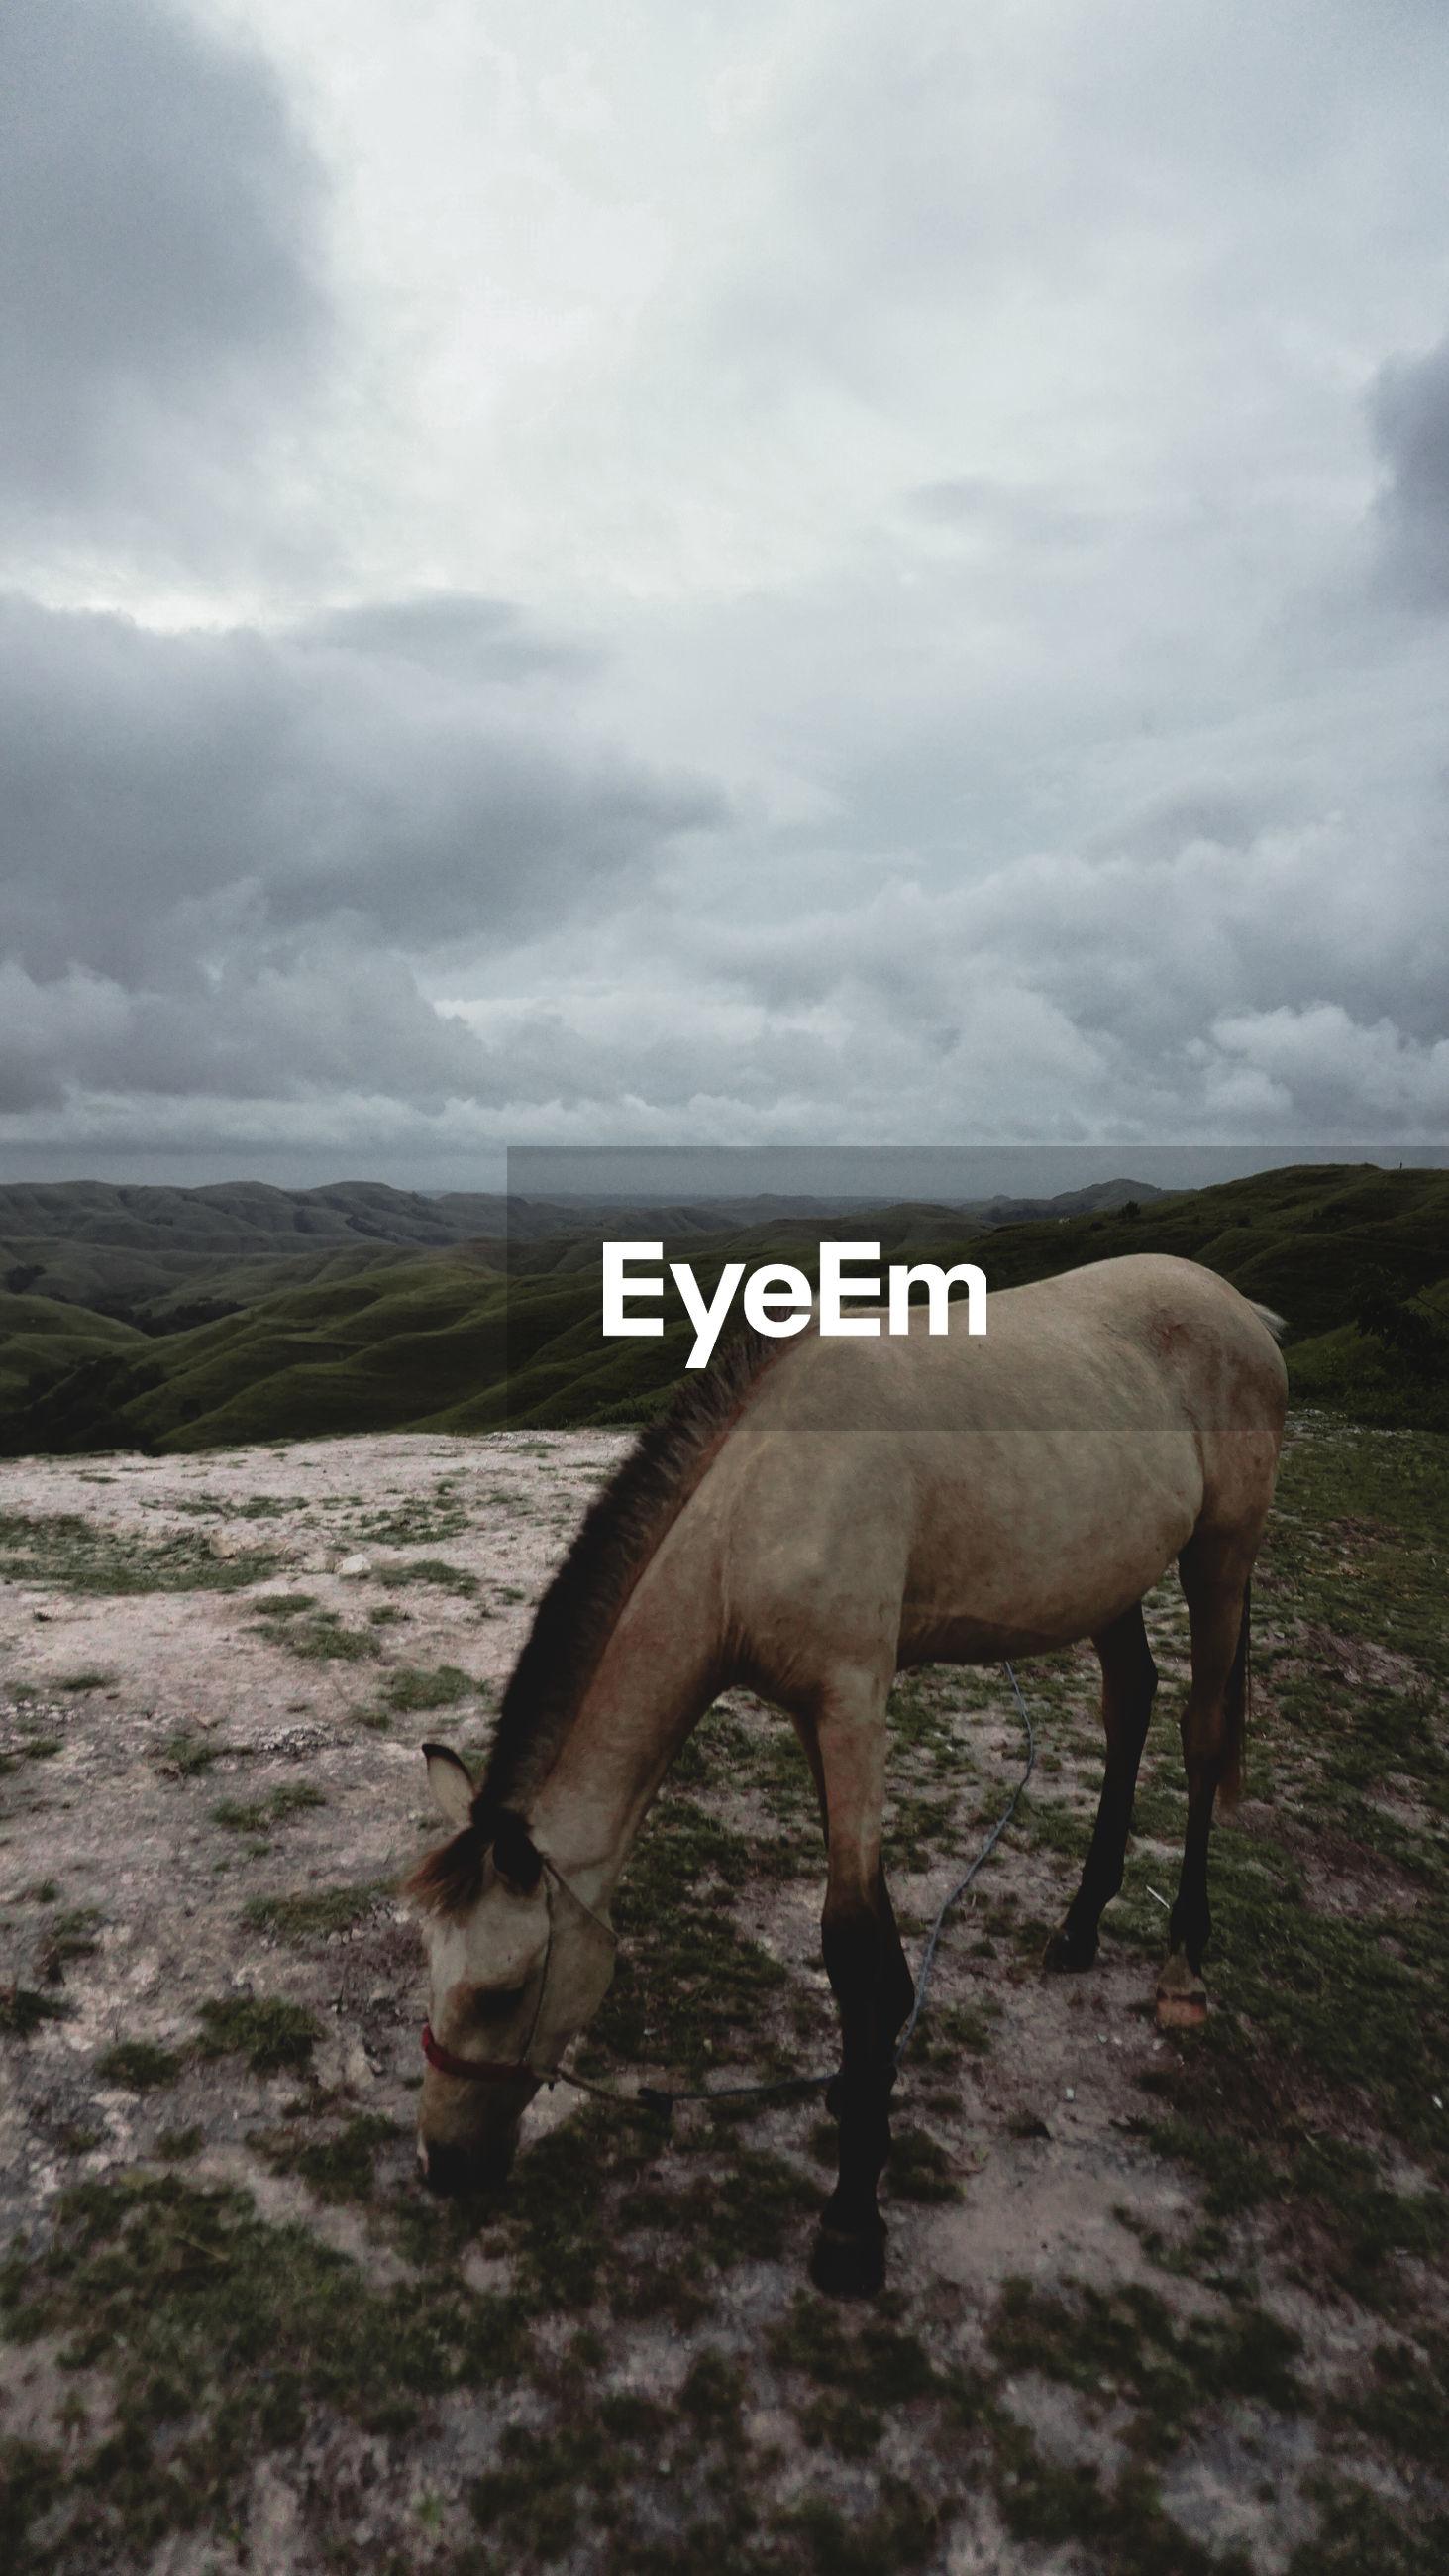 Horse on the hill, sumba island, indonesia